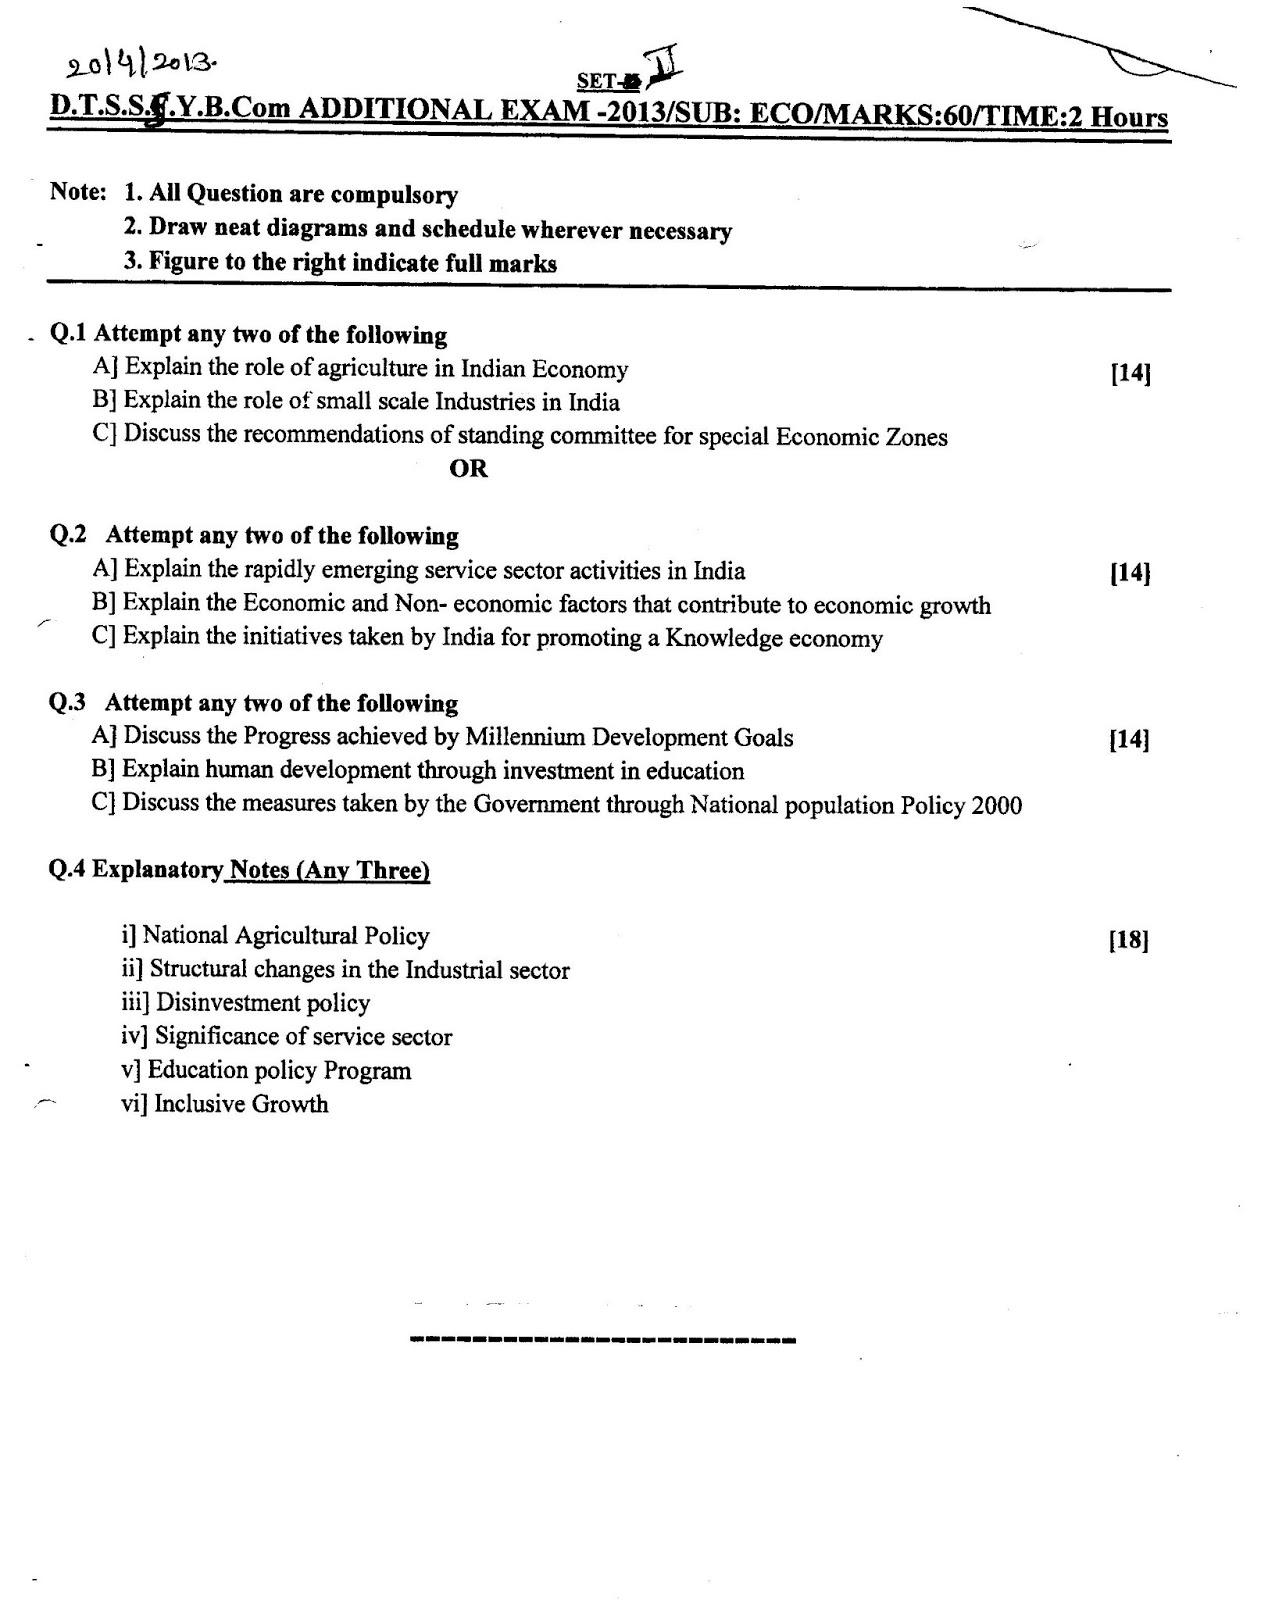 essay economic problem economic problem essay on the problems of  economic problem essay economic problem